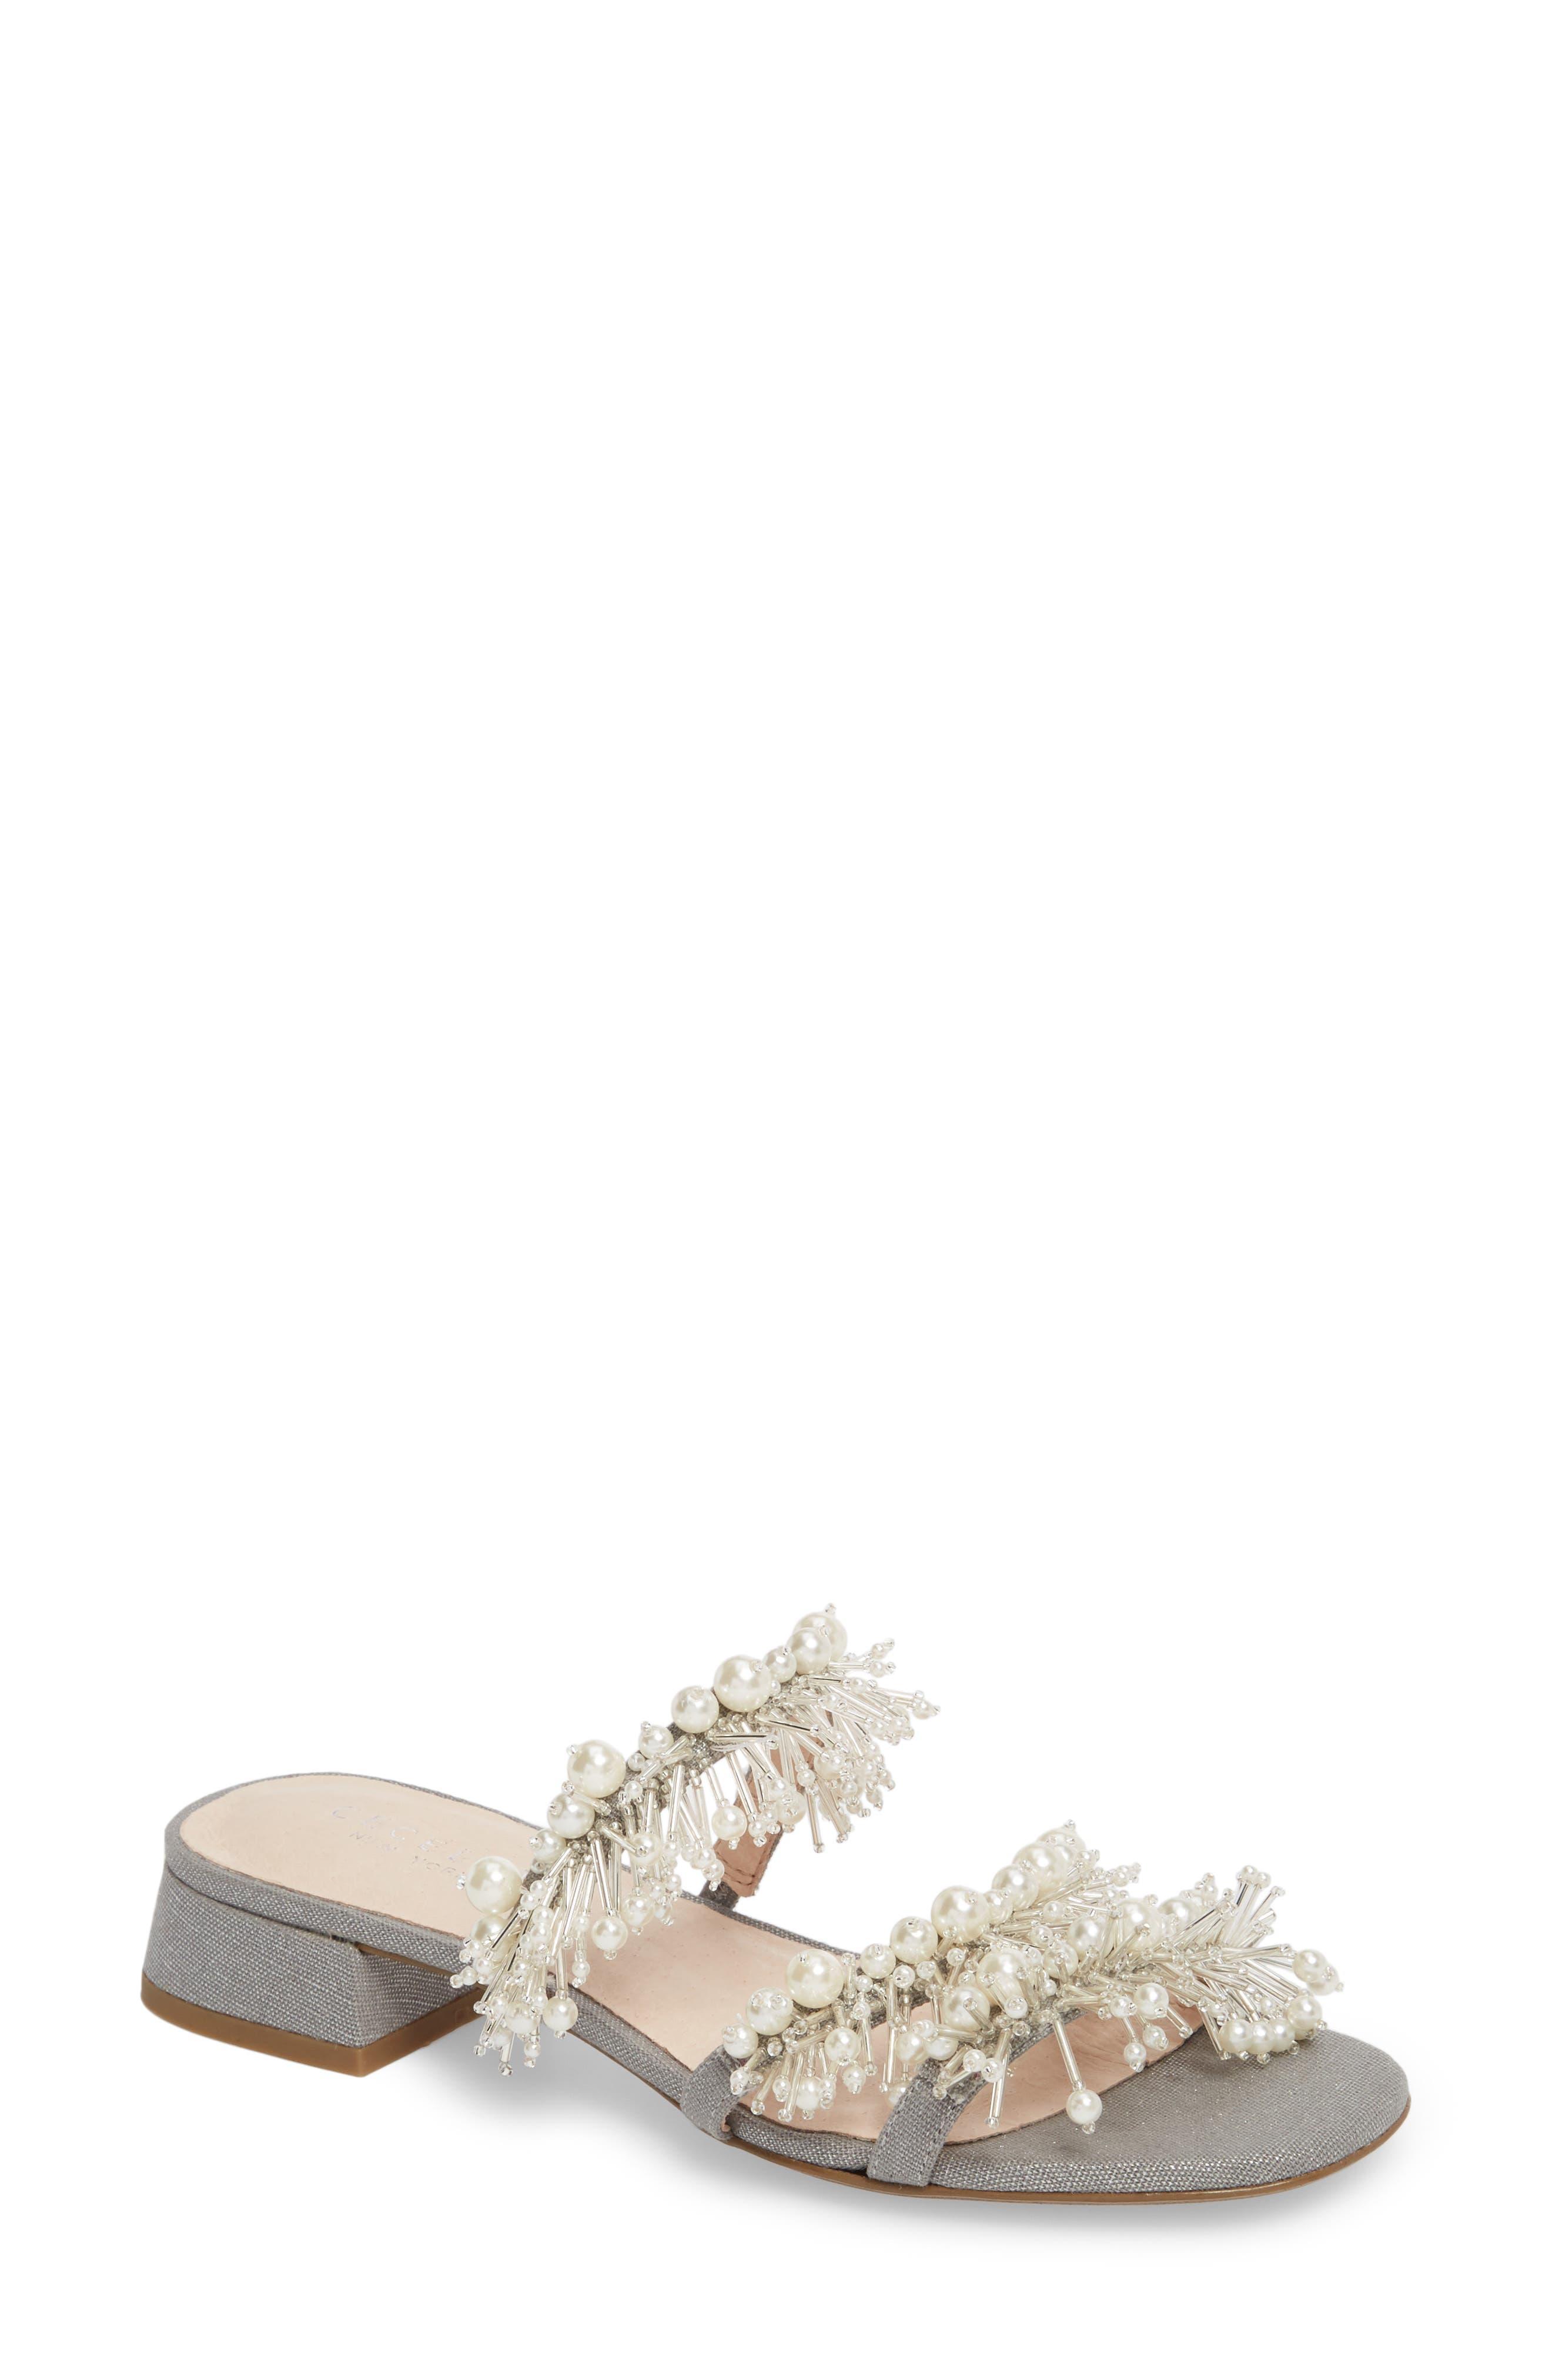 Fes Embellished Slide Sandal,                             Main thumbnail 1, color,                             Grey Fabric